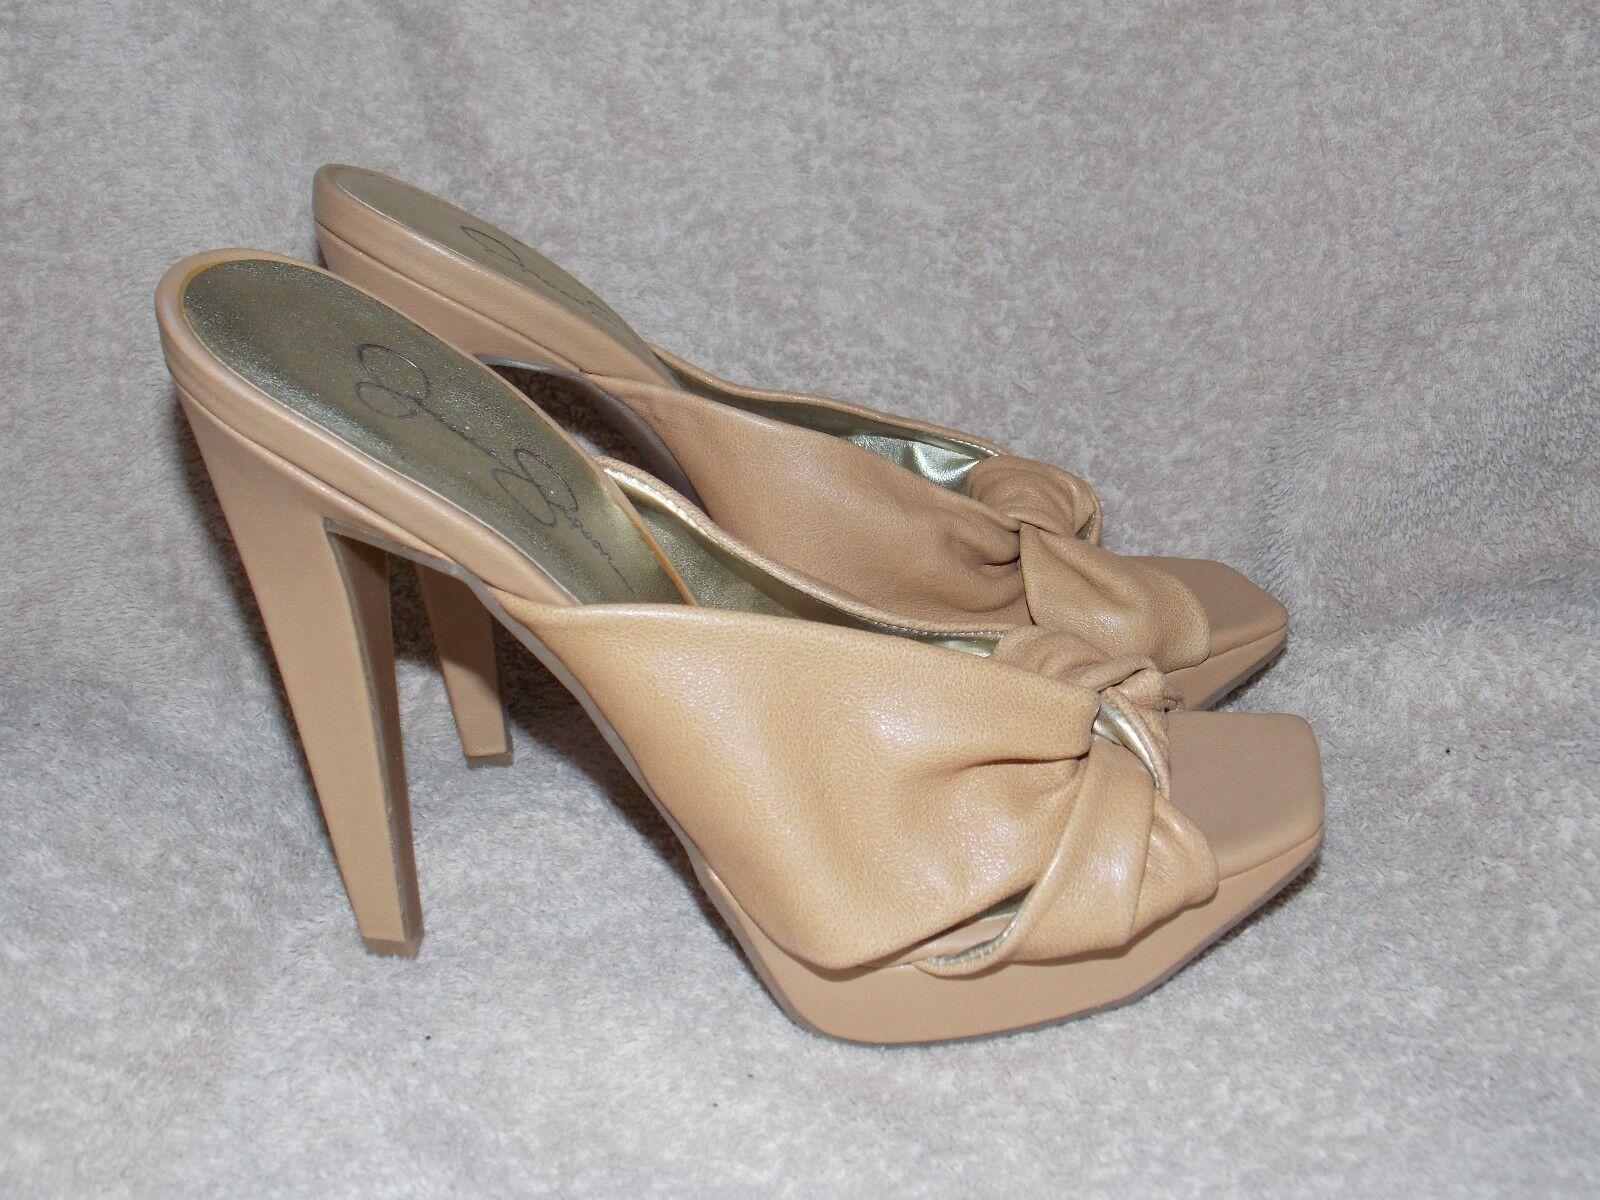 Jessic Simpson Tan Leather SALLY HONEY Tan Heels 8.5B Women Used